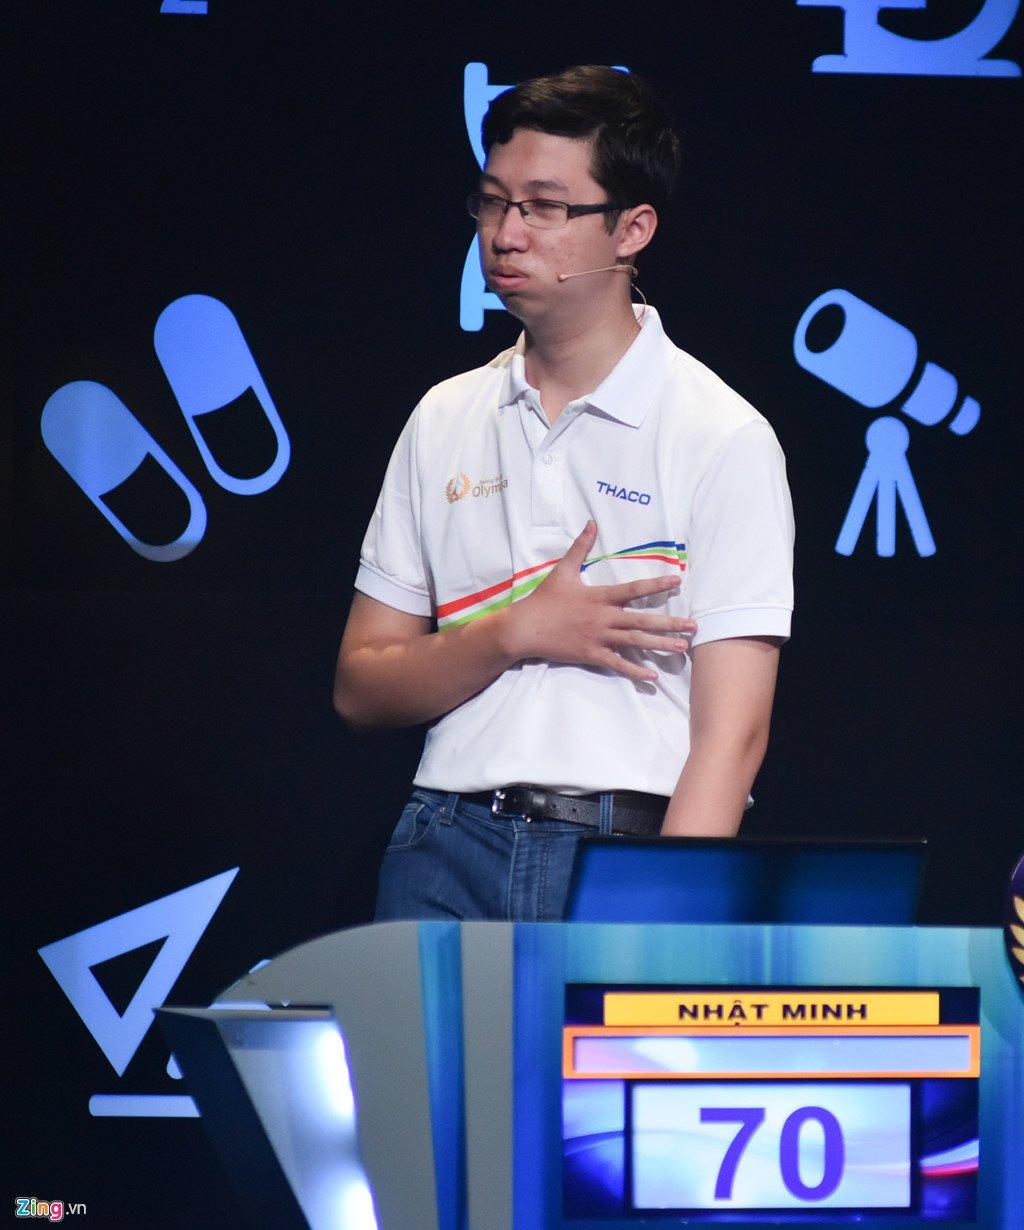 Anh: Khoanh khac dang quang Duong len dinh Olympia cua 'Cau be Google' Phan Dang Nhat Minh hinh anh 3